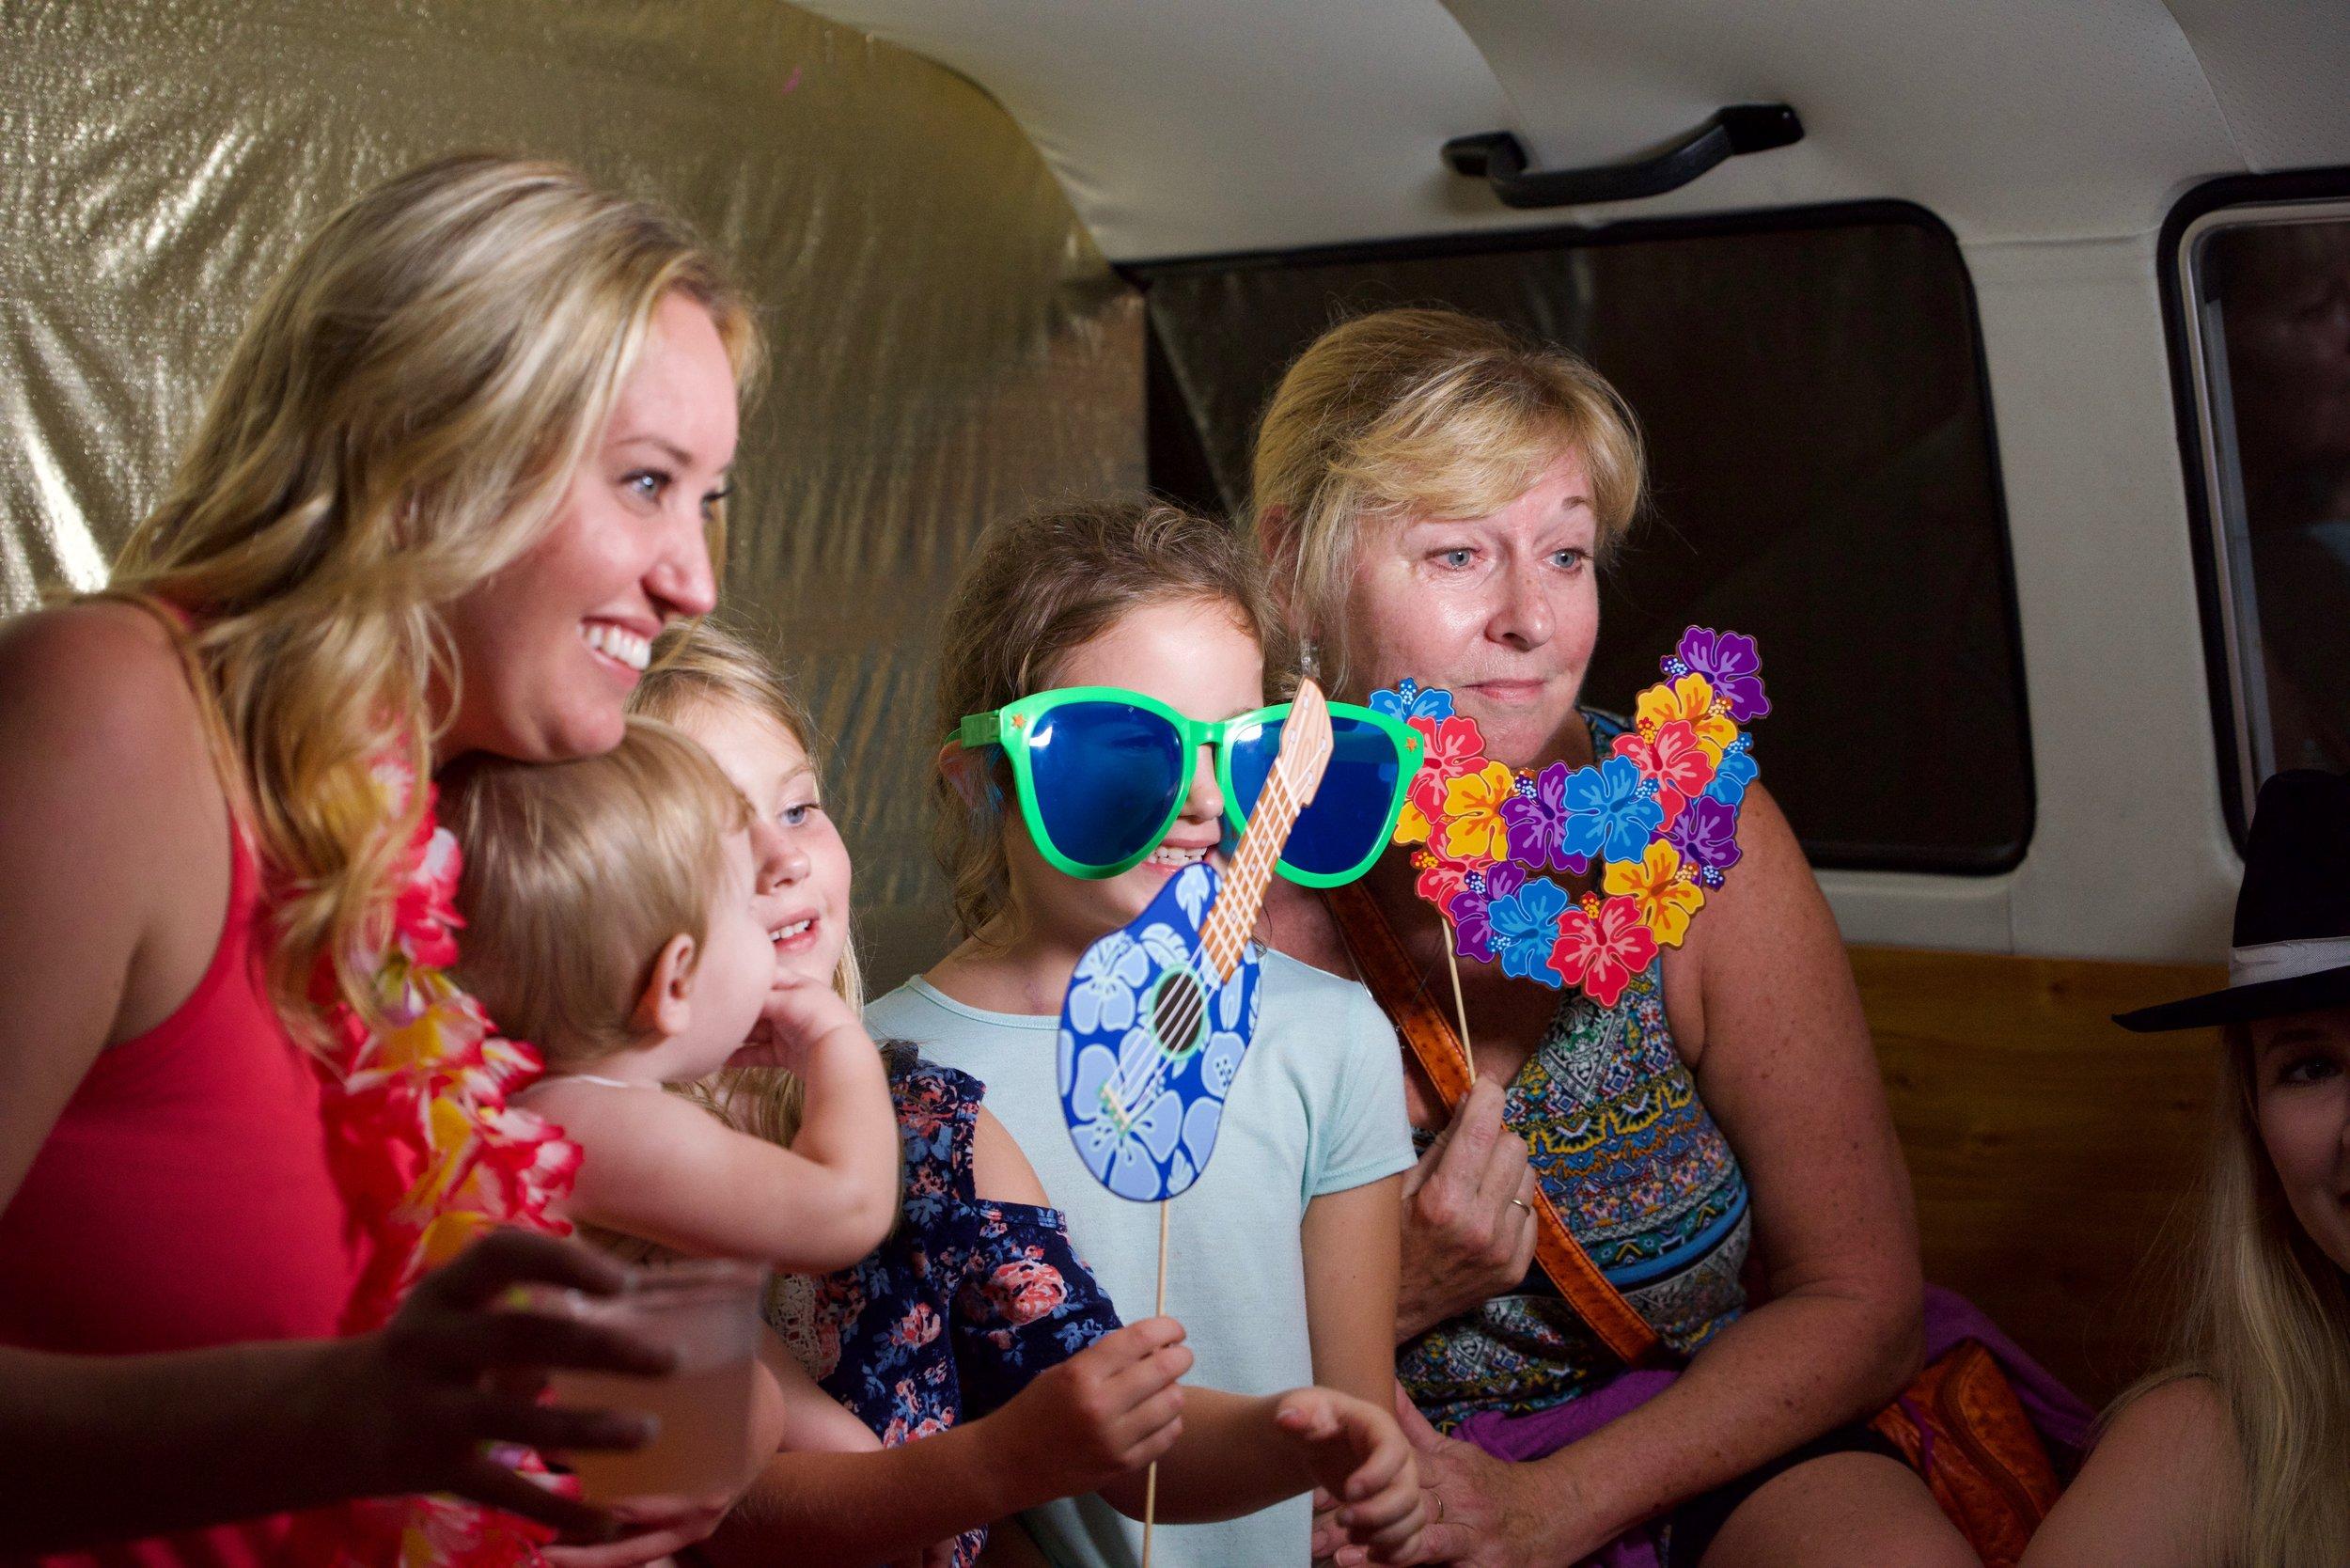 Family fun in the VW bus photo booth in Bradenton FL